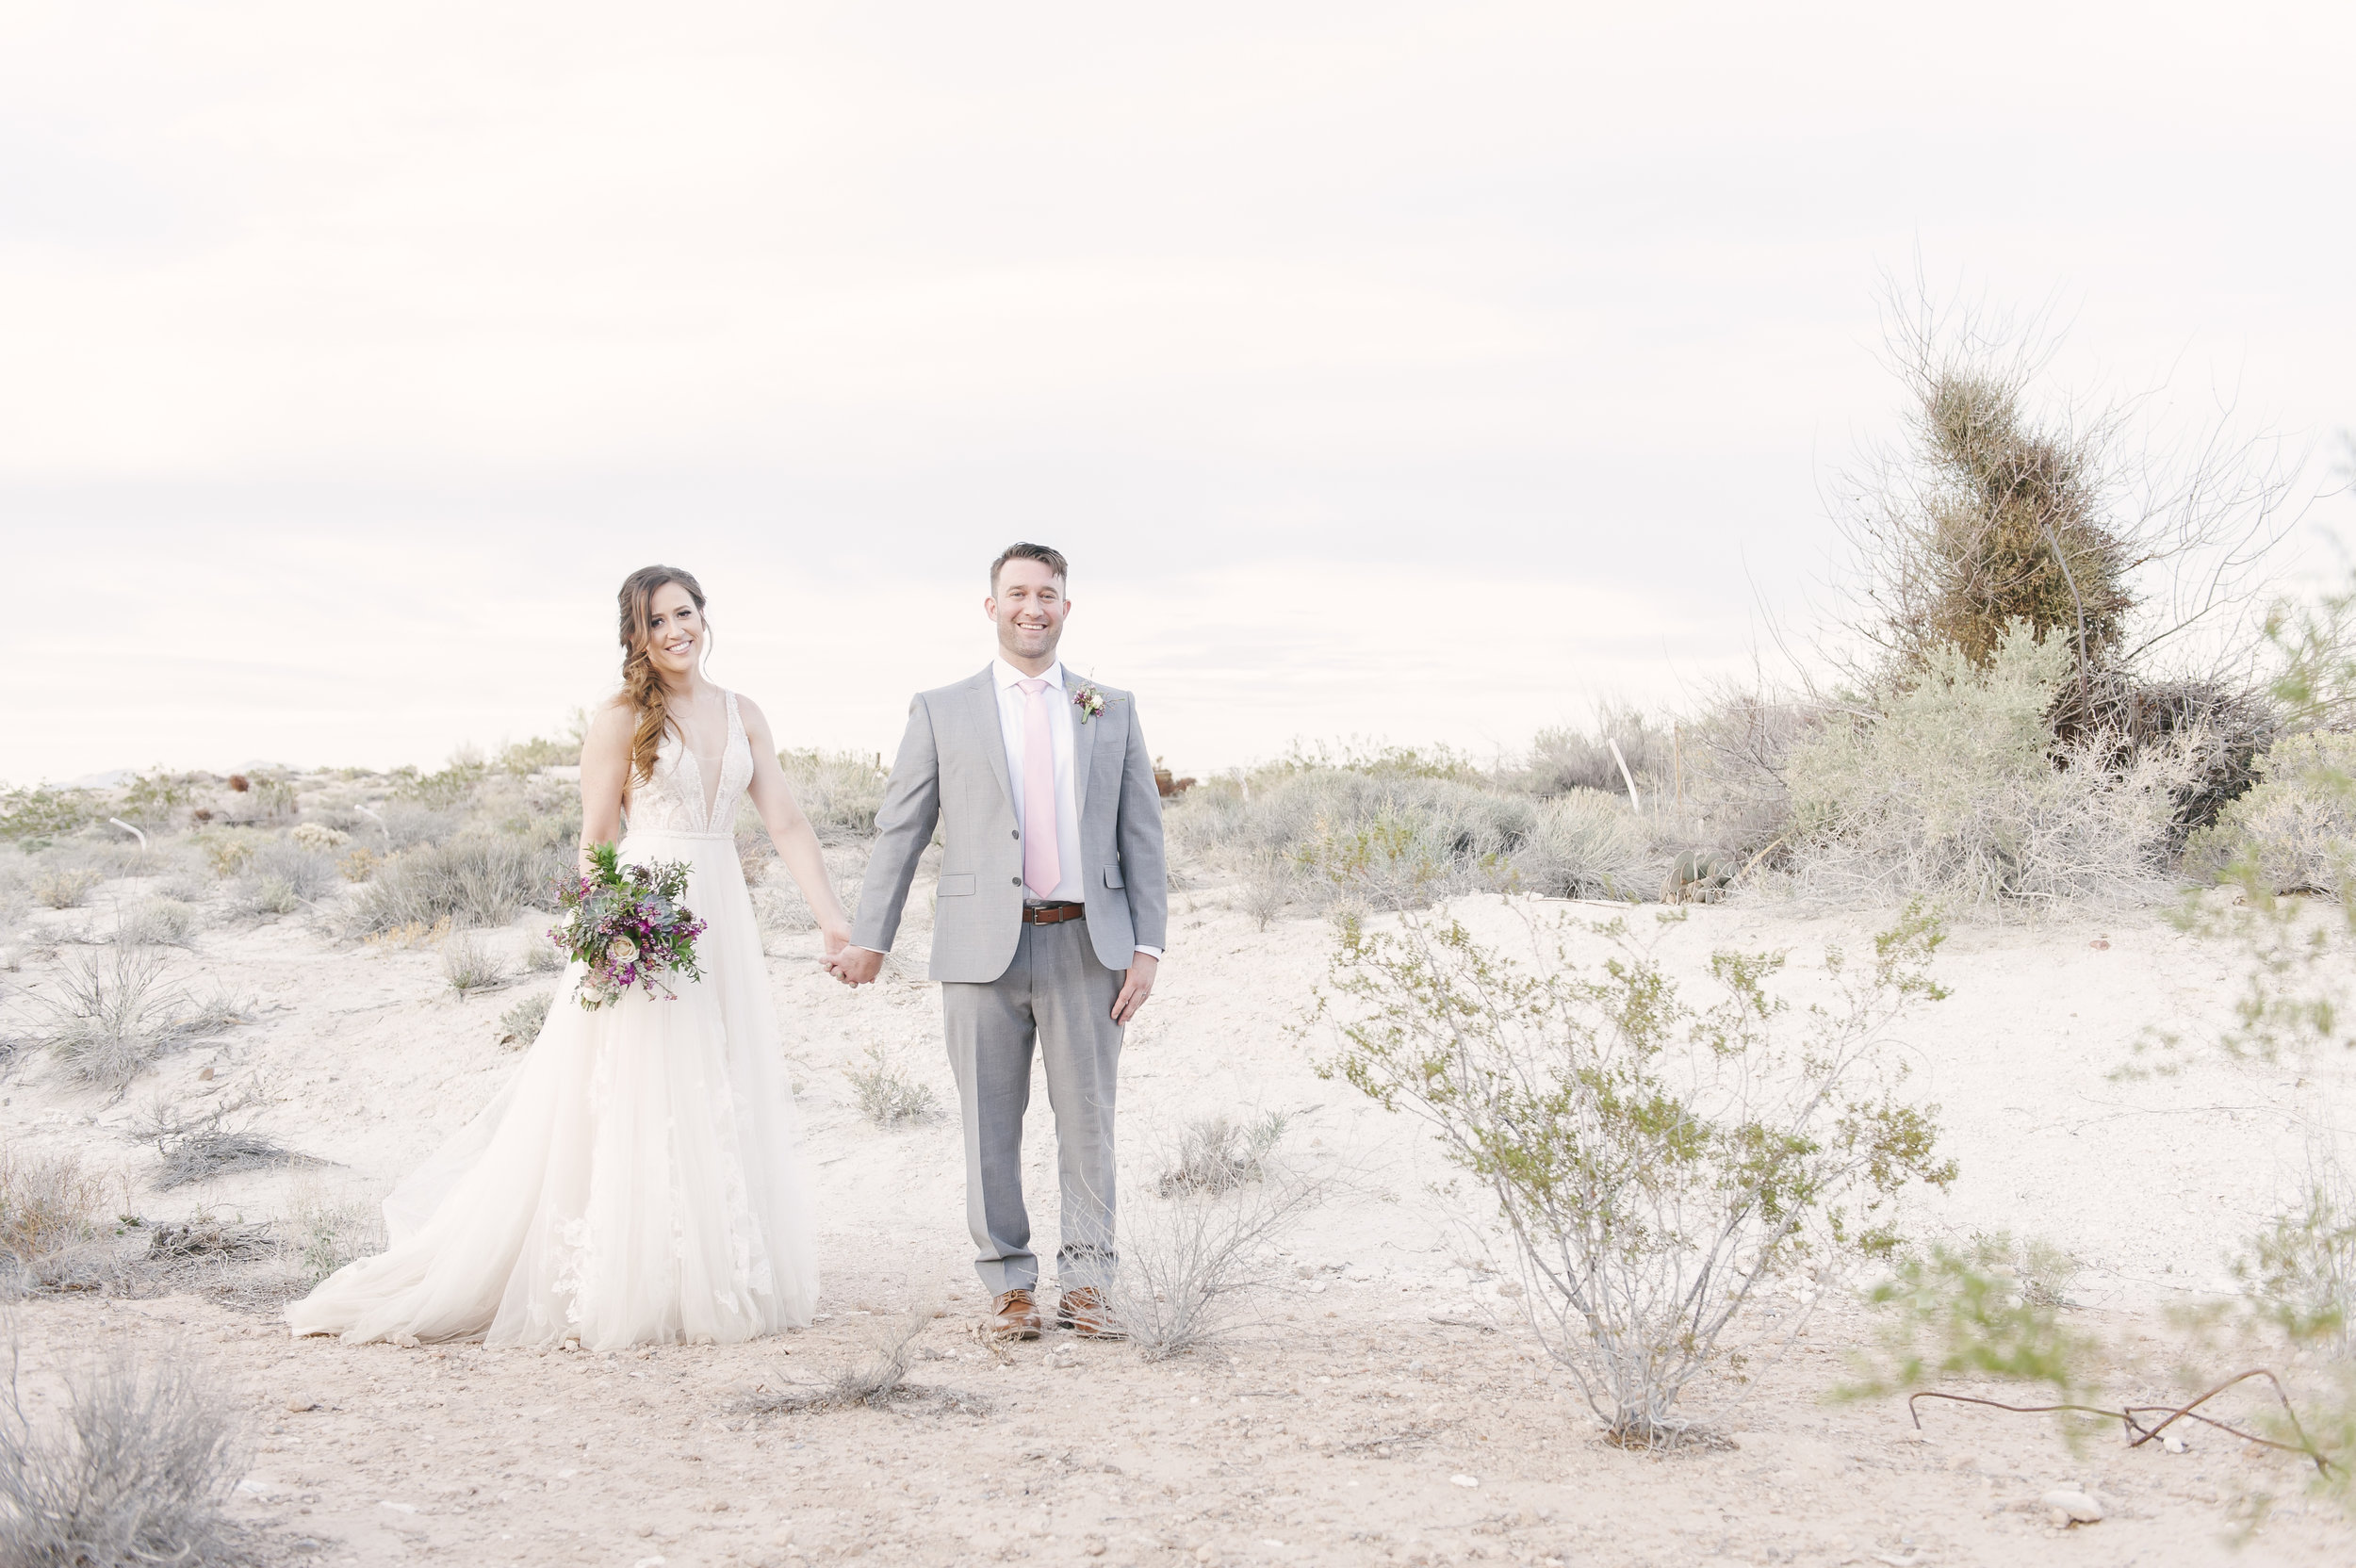 springs-preserve-wedding-las-vegas-destination-photography-the-emerics-01-4.jpg